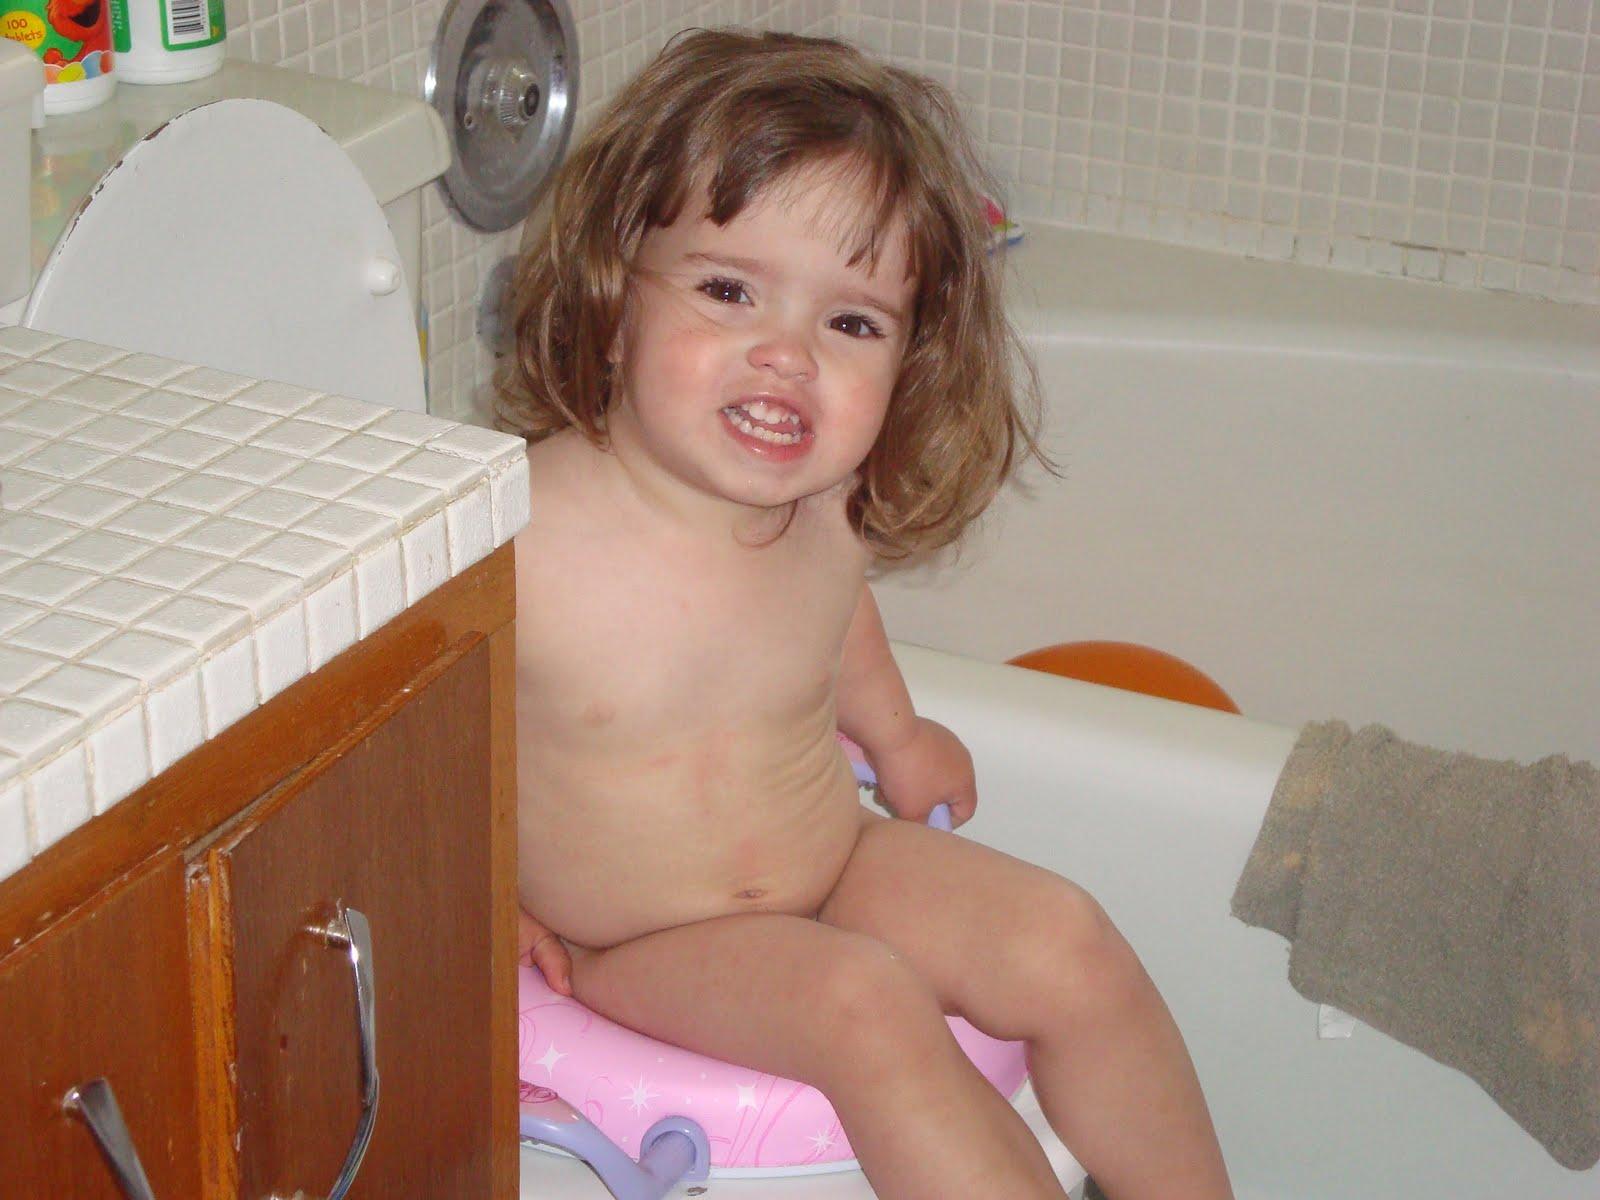 kirstie alley boobs sex porn images